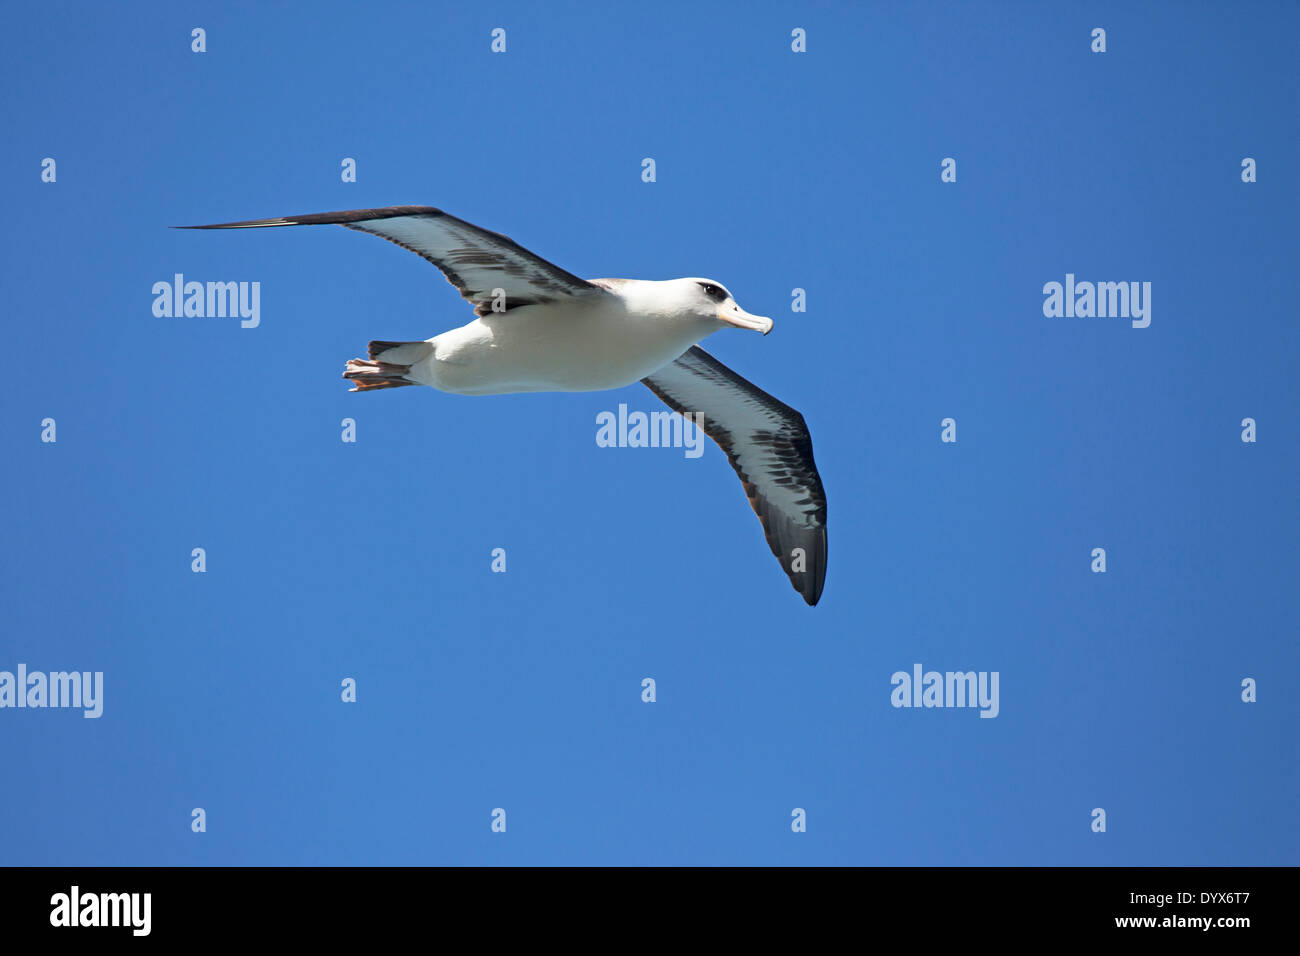 Laysan Albatross (Phoebastria immutabilis) soaring over Kīlauea Point National Wildlife Refuge Stock Photo